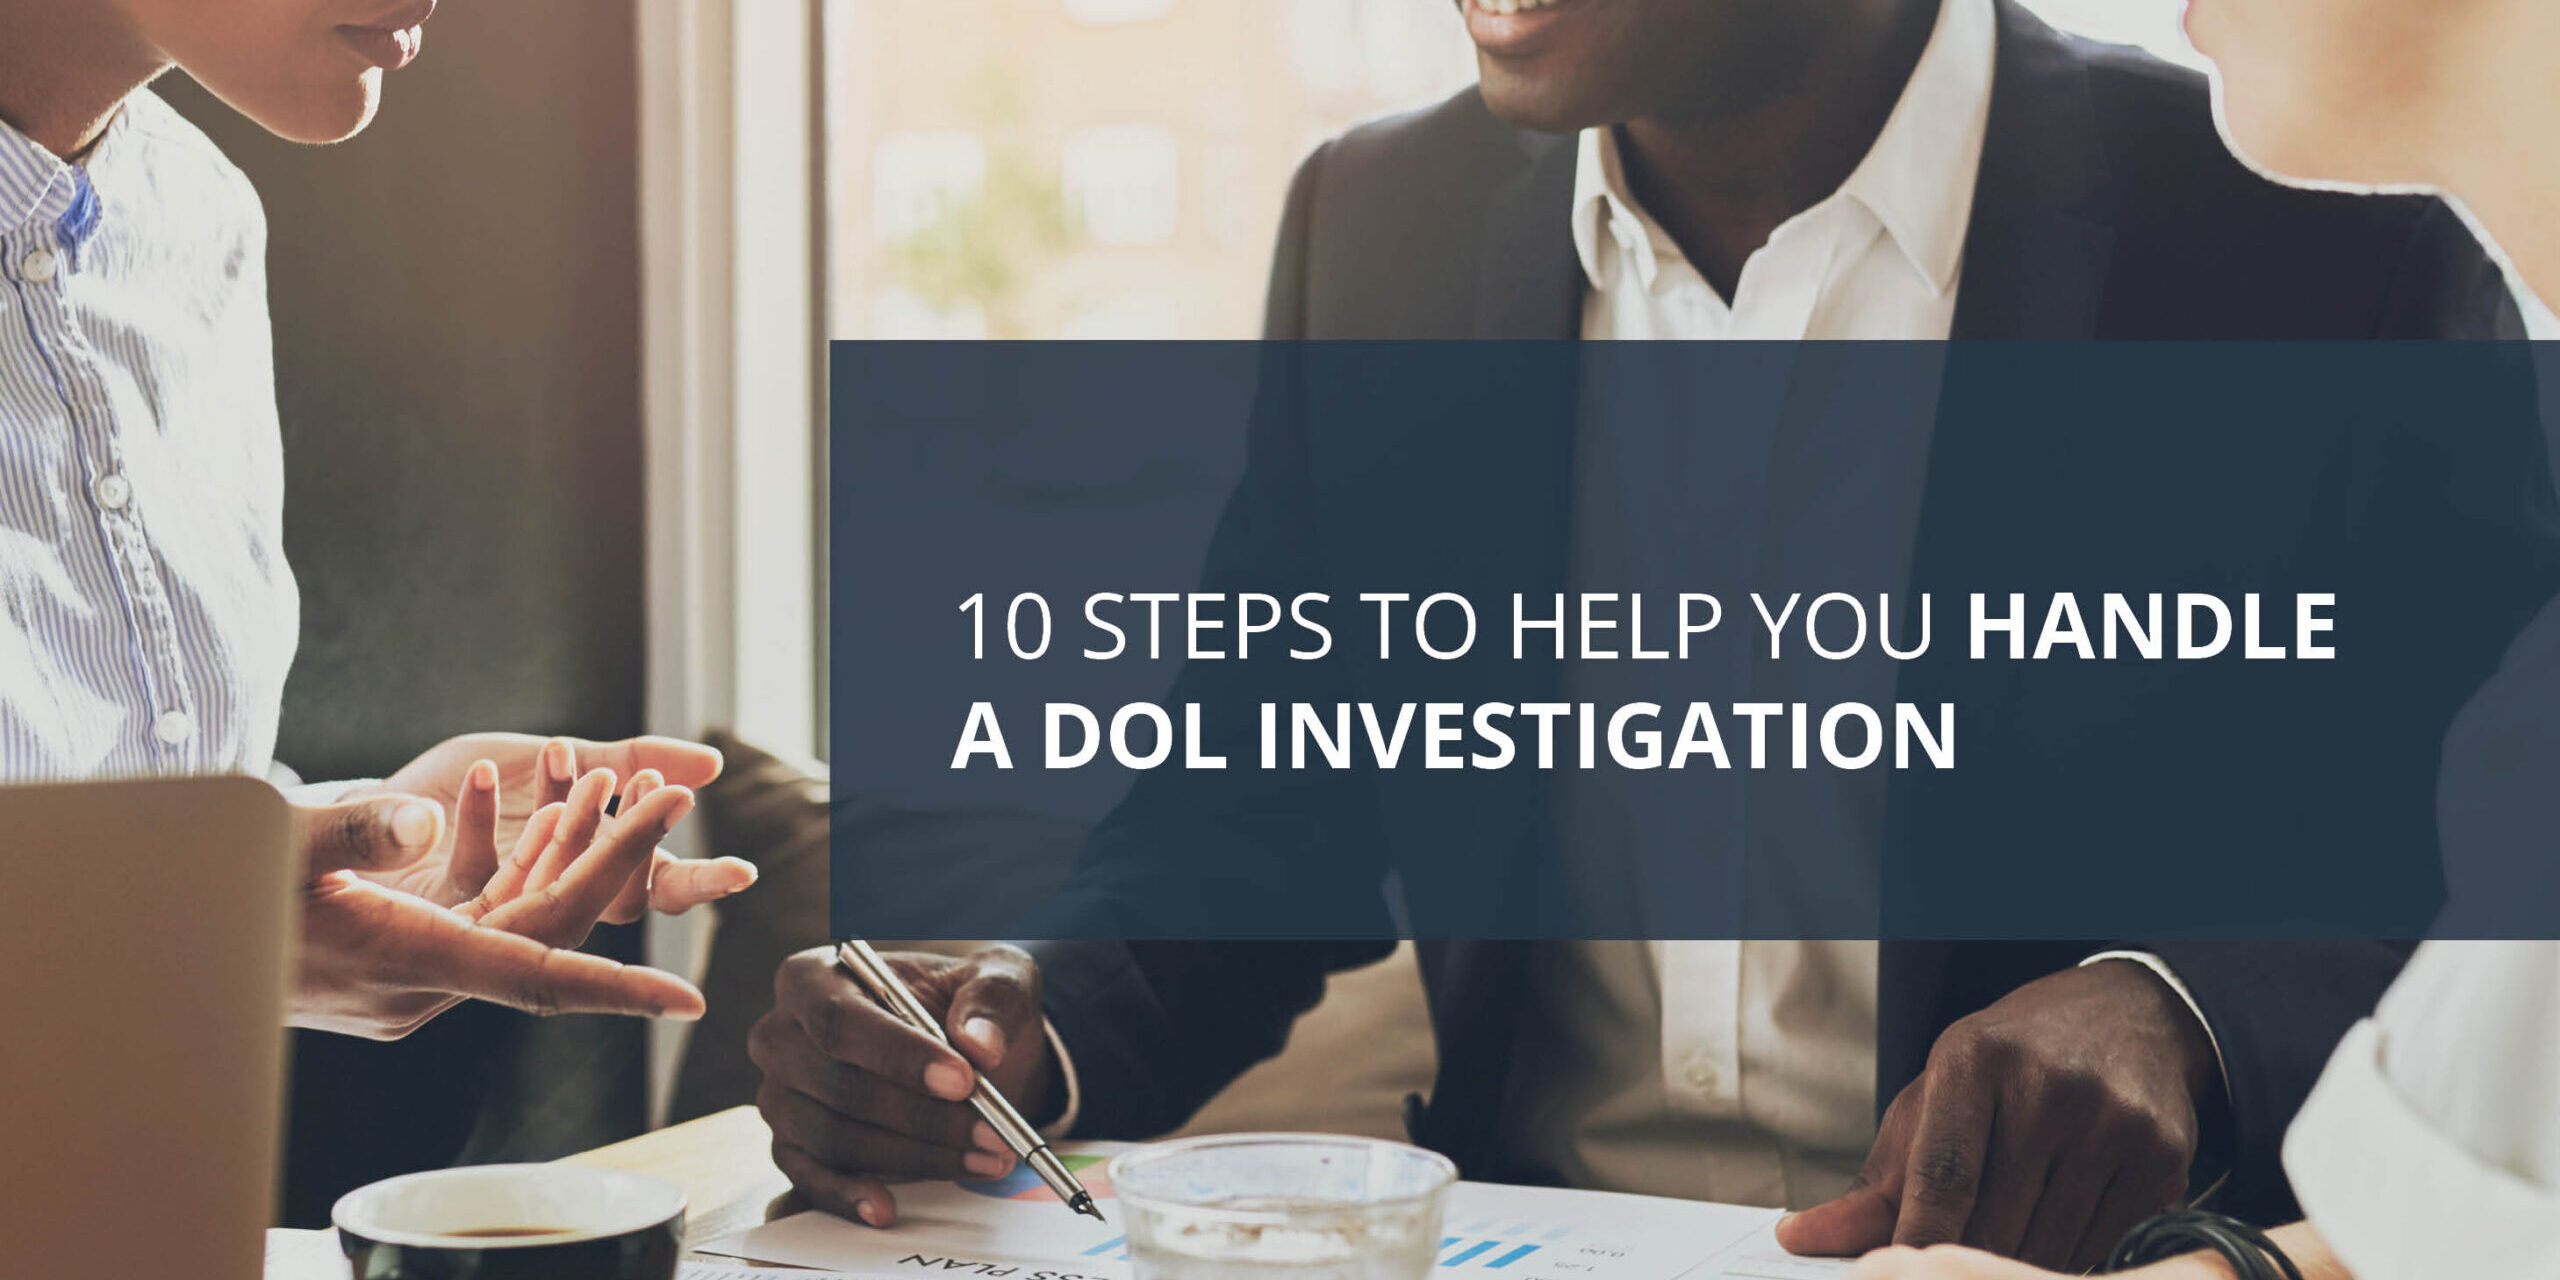 Headline Image - 10 Steps to Help You Handle a DOL Investigation